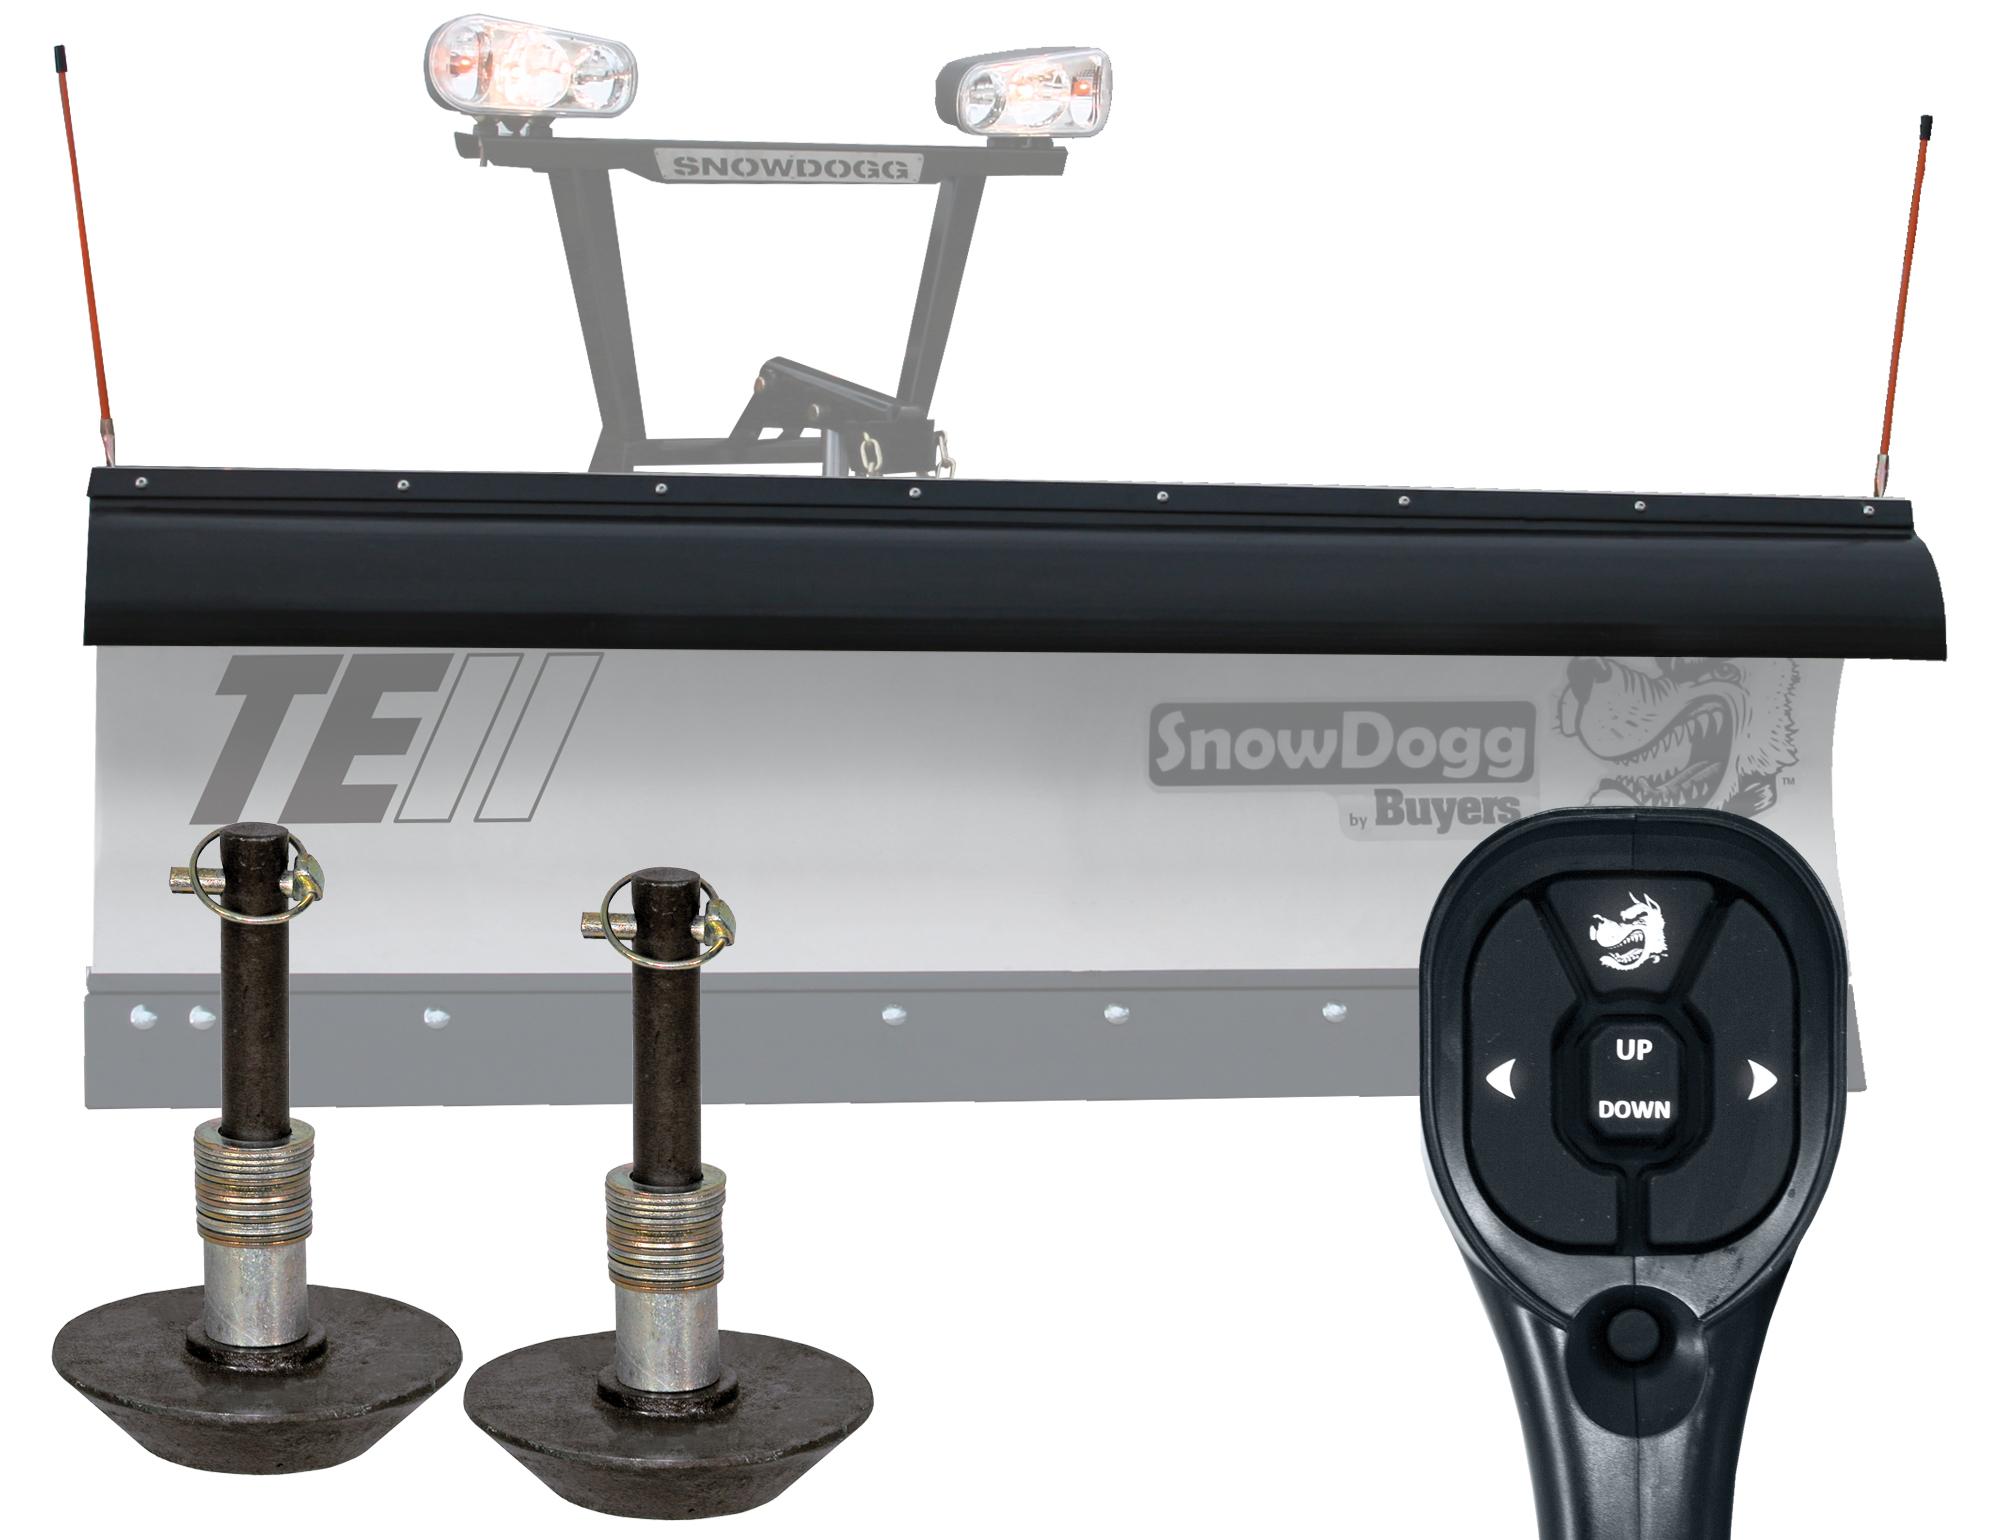 New Buyers TE75II Model, Straight blade, Trip edge Stainless Steel Straight Blade, Standard